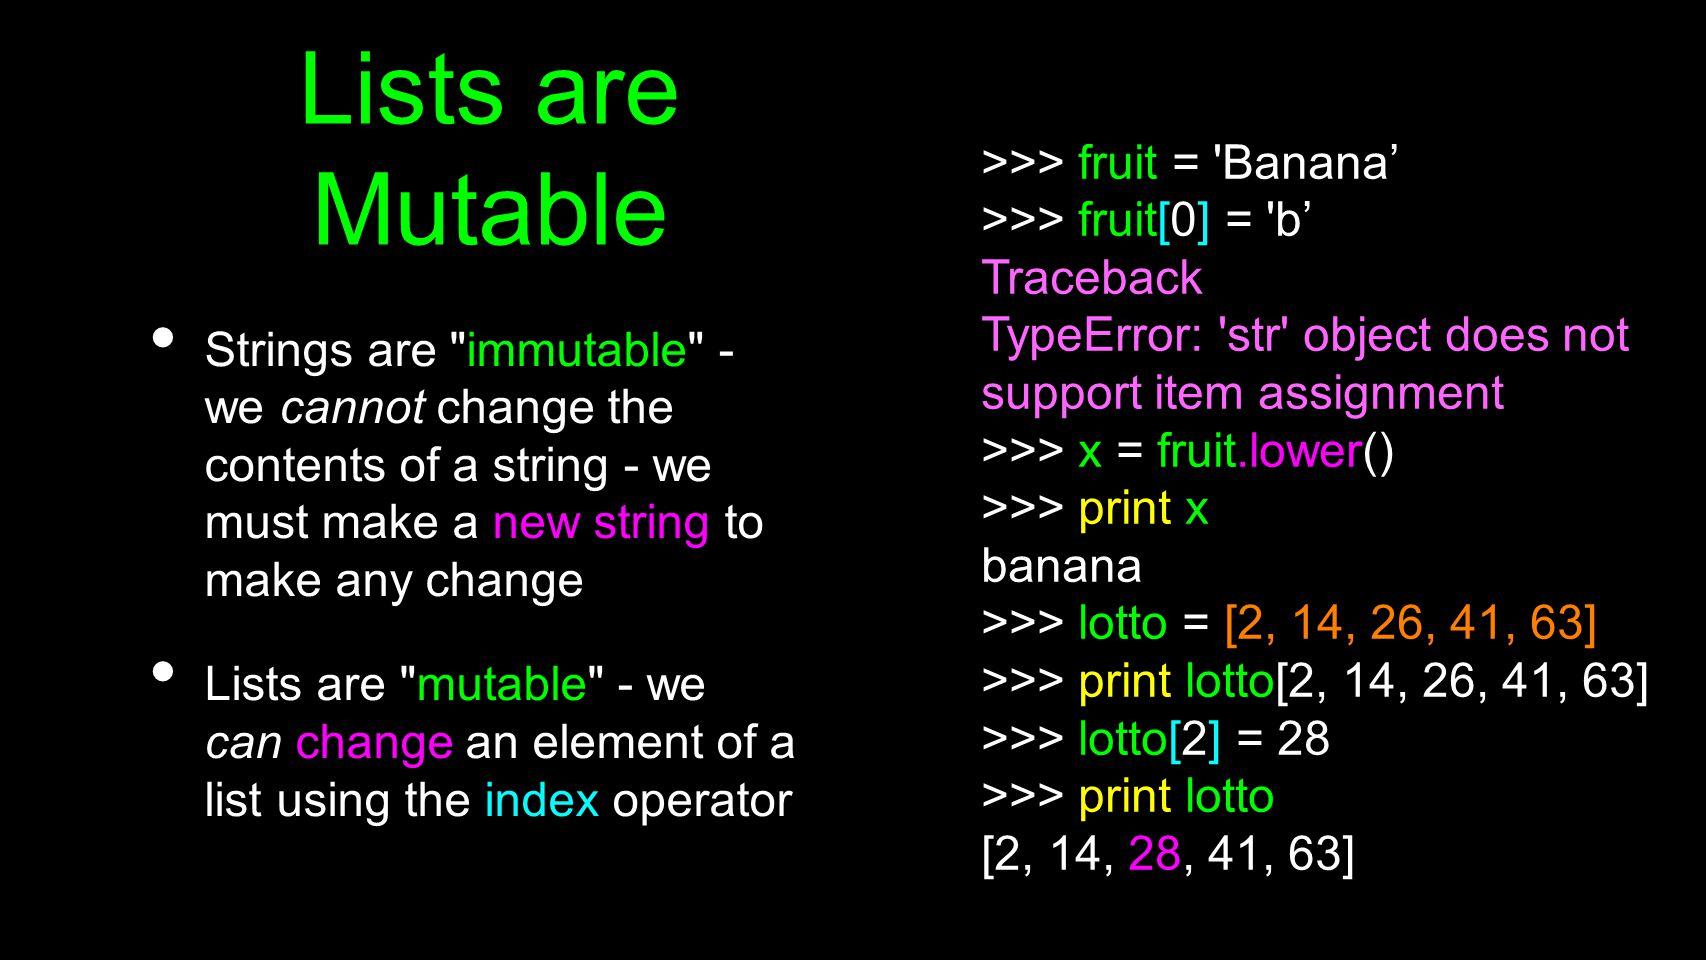 numlist = list() while True : inp = raw_input( Enter a number: ) if inp == done : break value = float(inp) numlist.append(value) average = sum(numlist) / len(numlist) print Average: , average total = 0 count = 0 while True : inp = raw_input( Enter a number: ) if inp == done : break value = float(inp) total = total + value count = count + 1 average = total / count print Average: , average Enter a number: 3 Enter a number: 9 Enter a number: 5 Enter a number: done Average: 5.66666666667